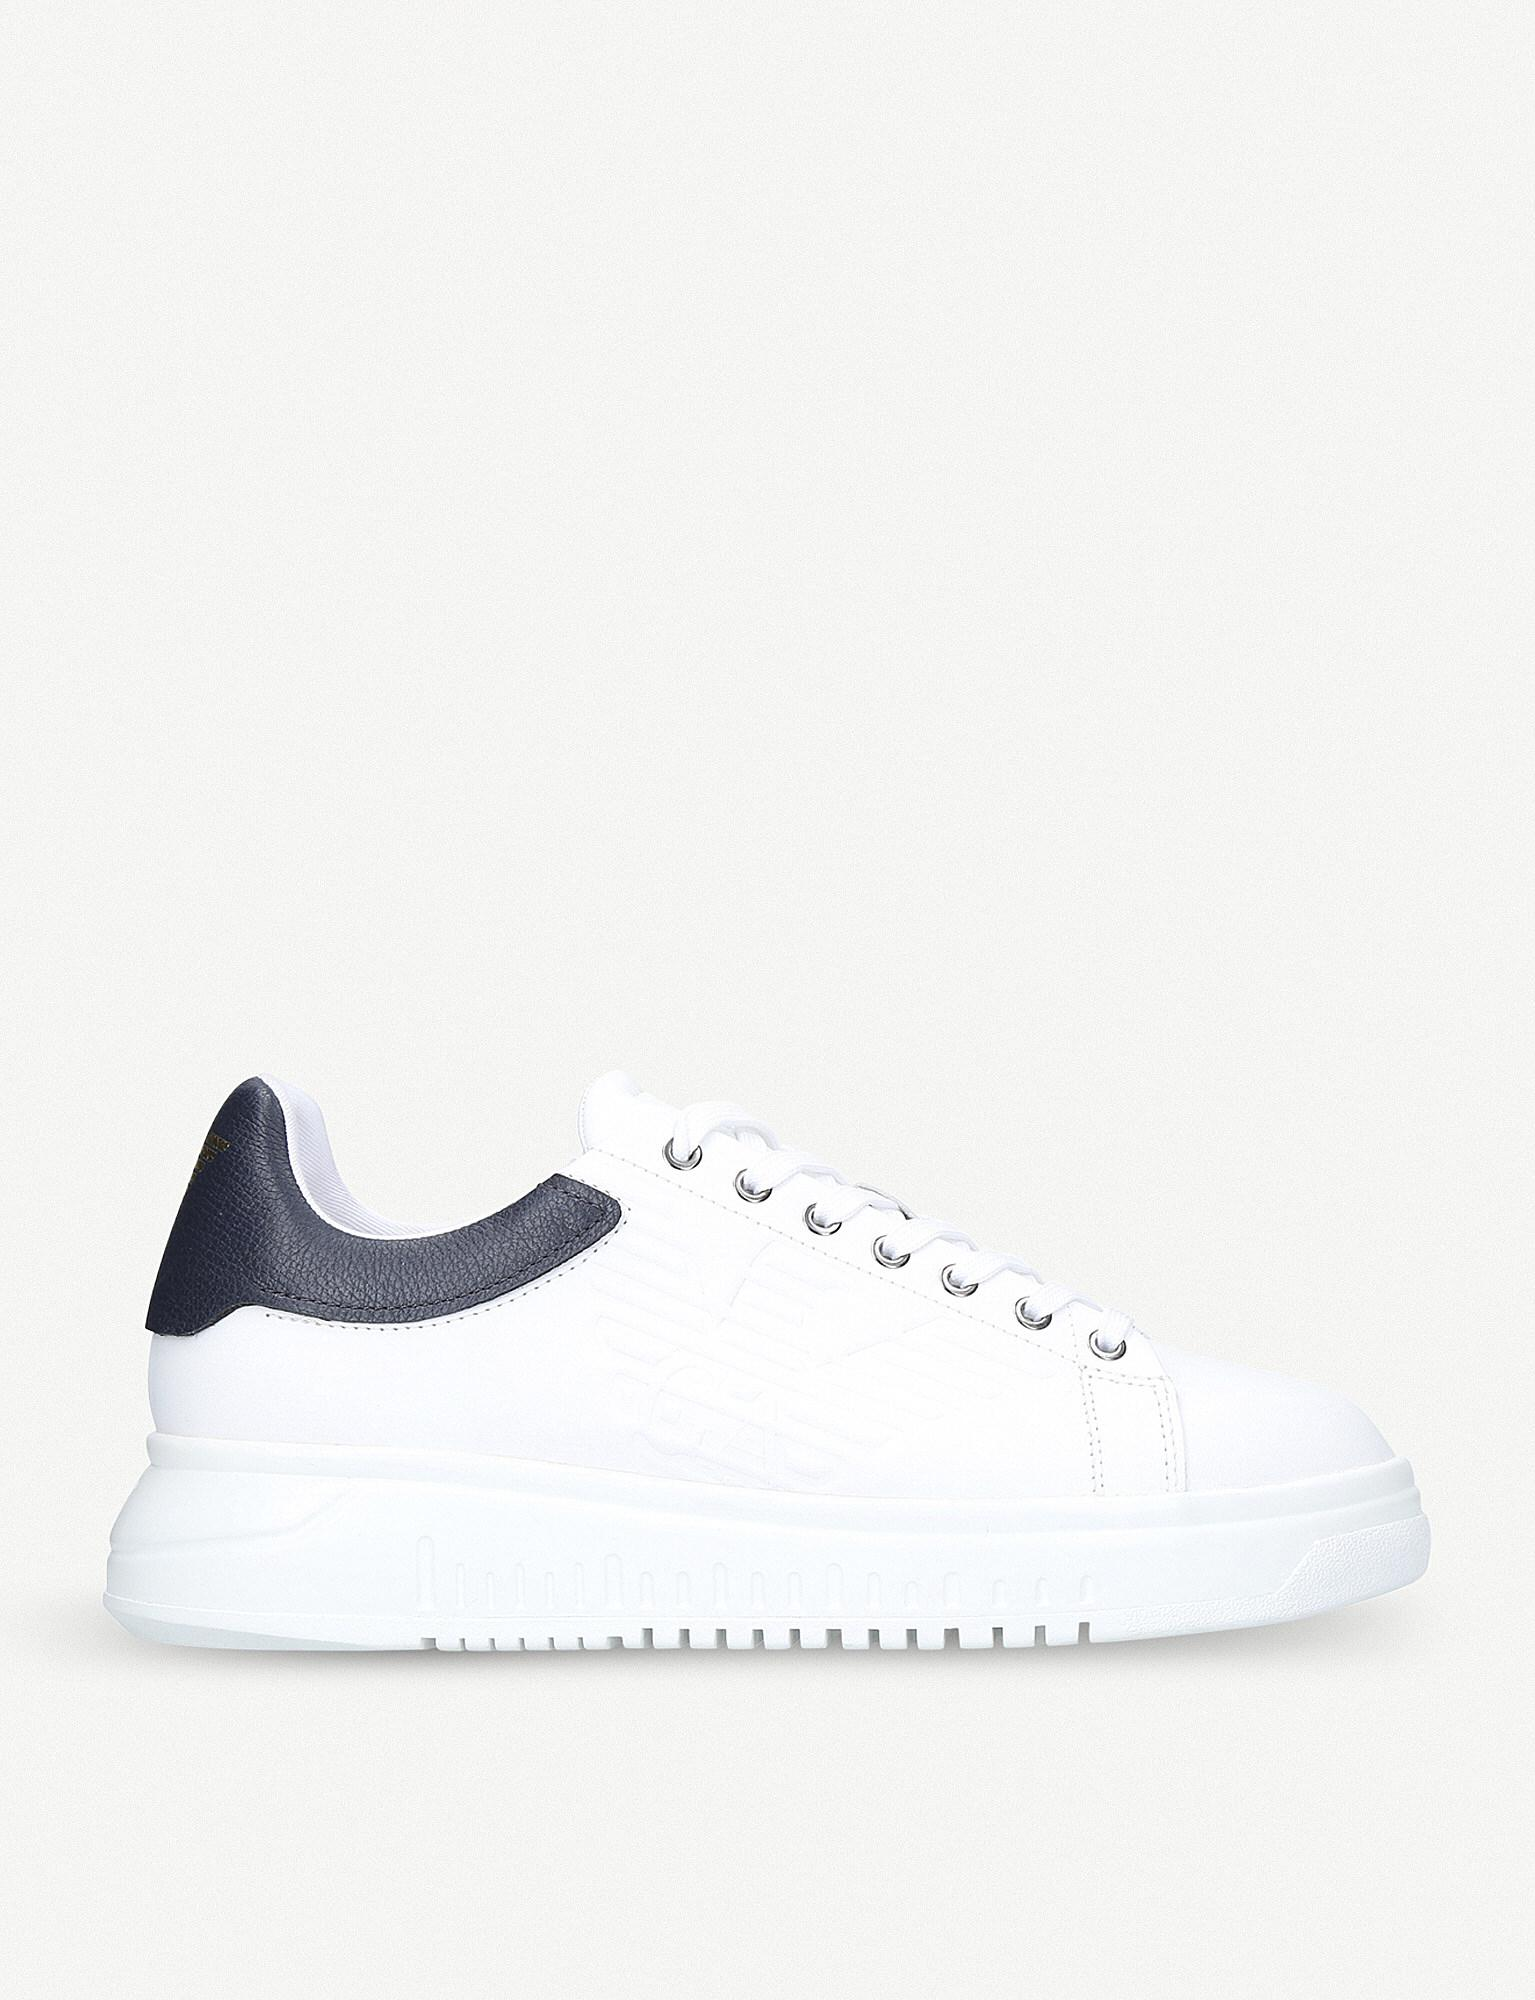 Armani Icon White For In Trainers Lyst Men Leather Eagle Giorgio vwn0mN8